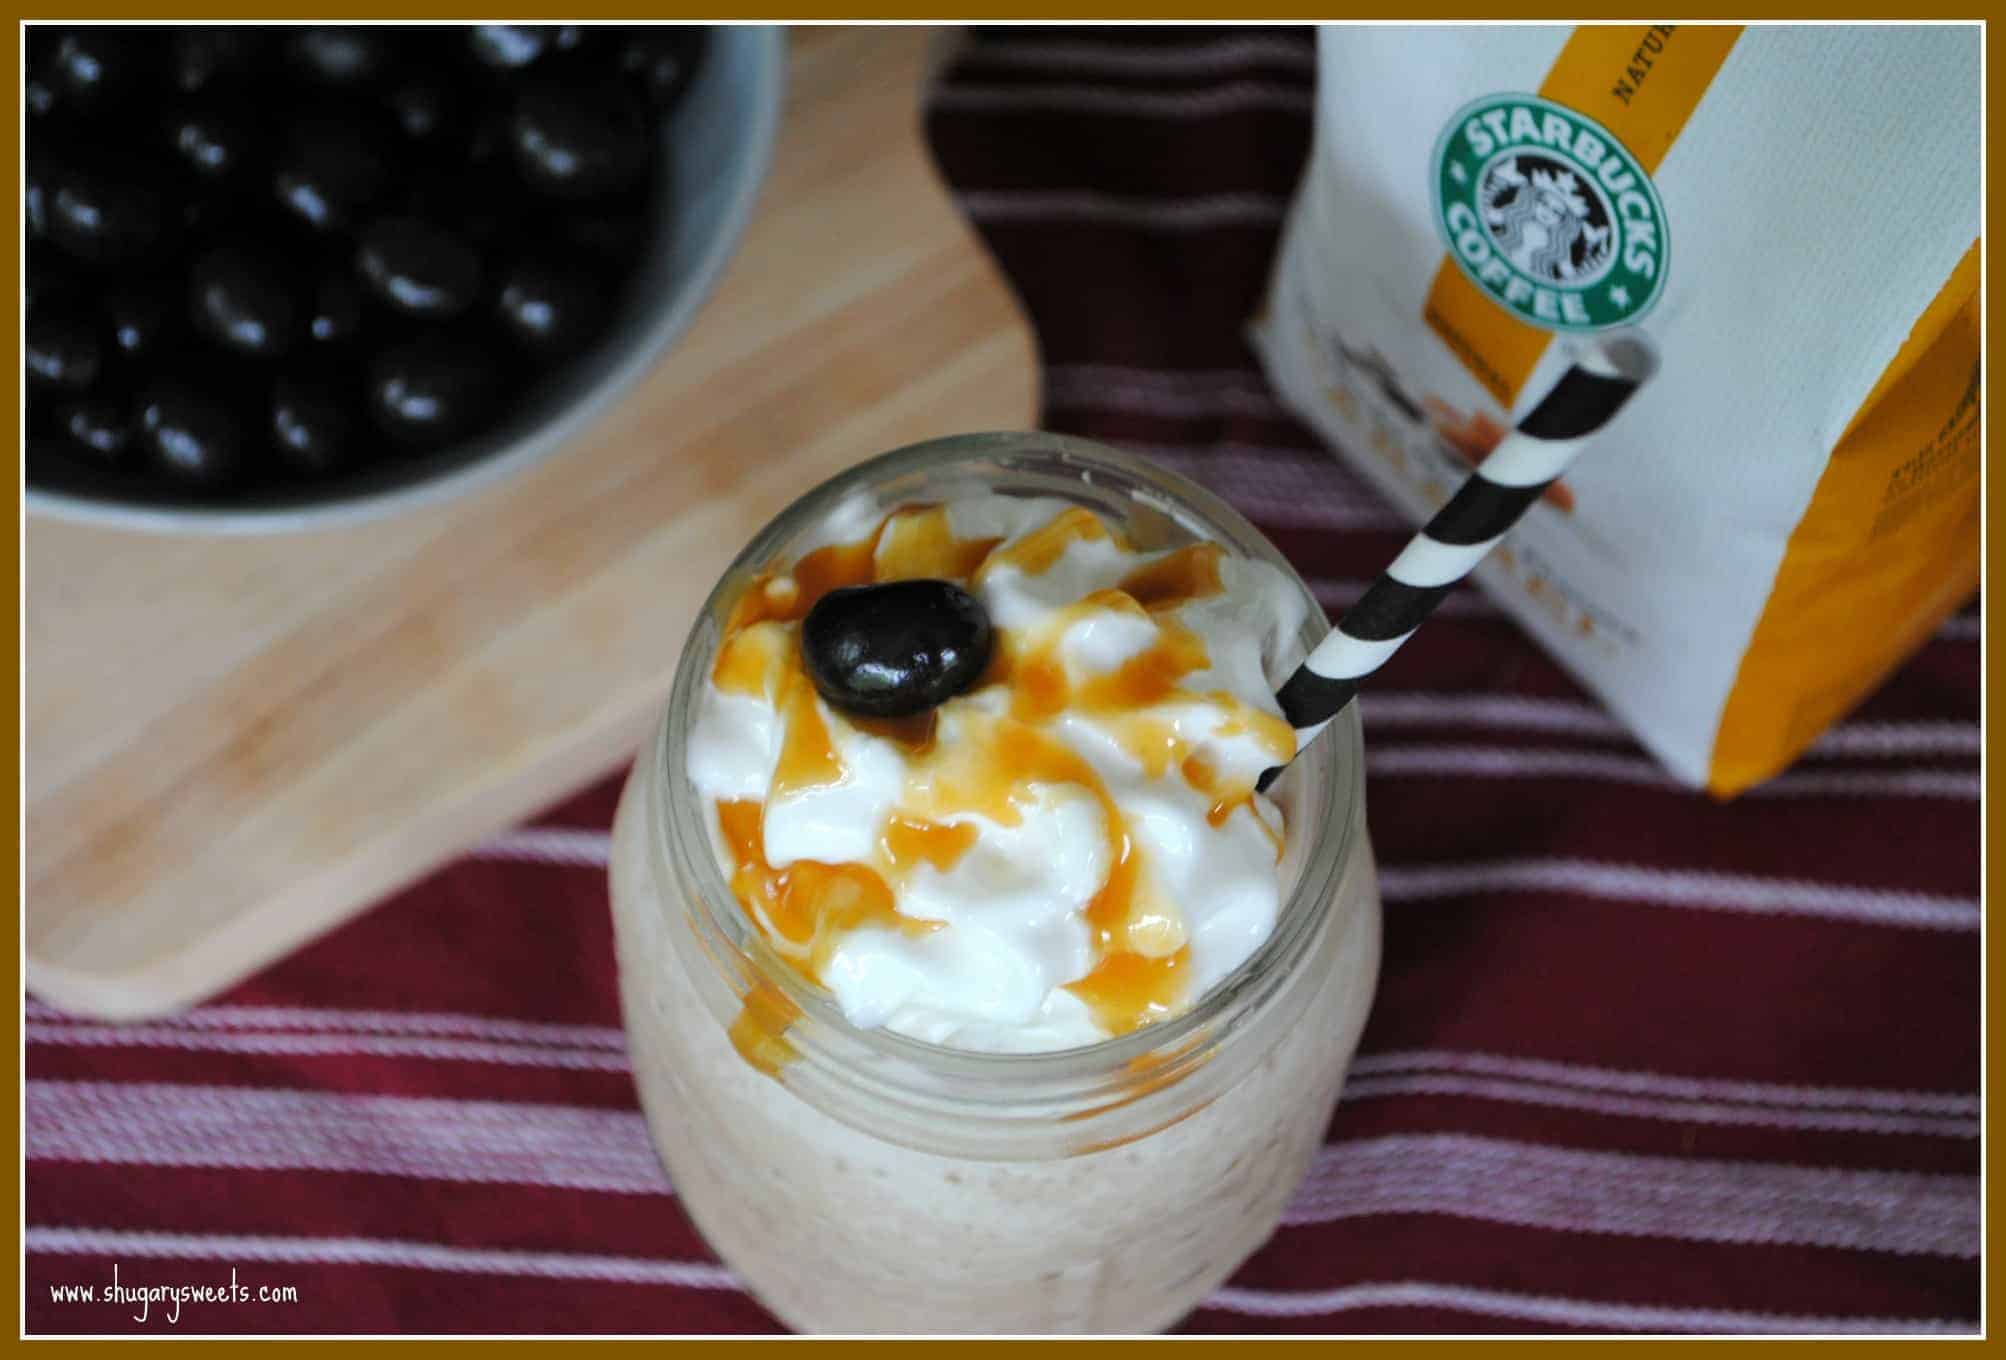 Caramel Coffee Milkshakes from www.shugarysweets.com